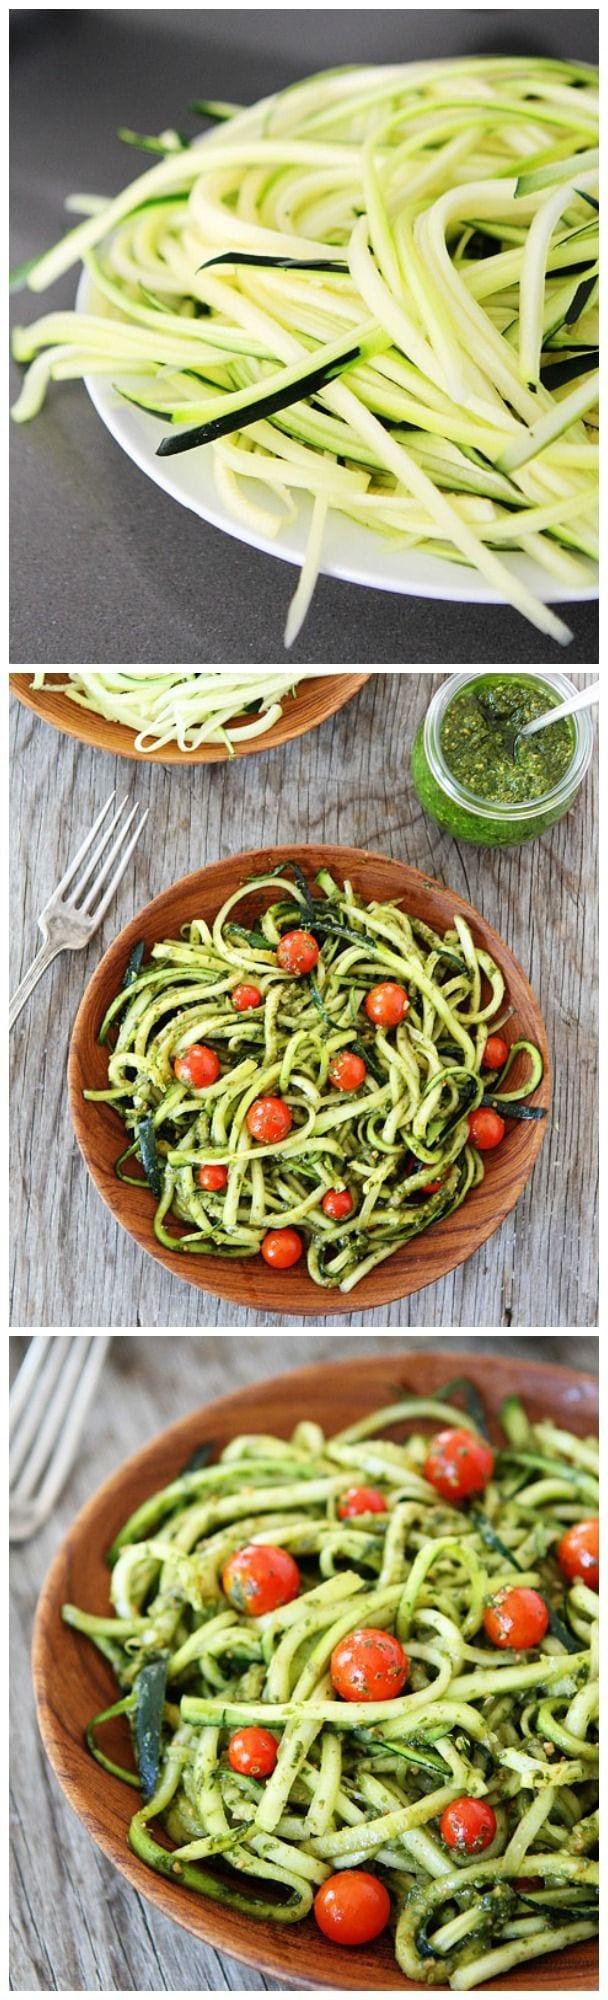 Blog dieta paleo noodles calabacing